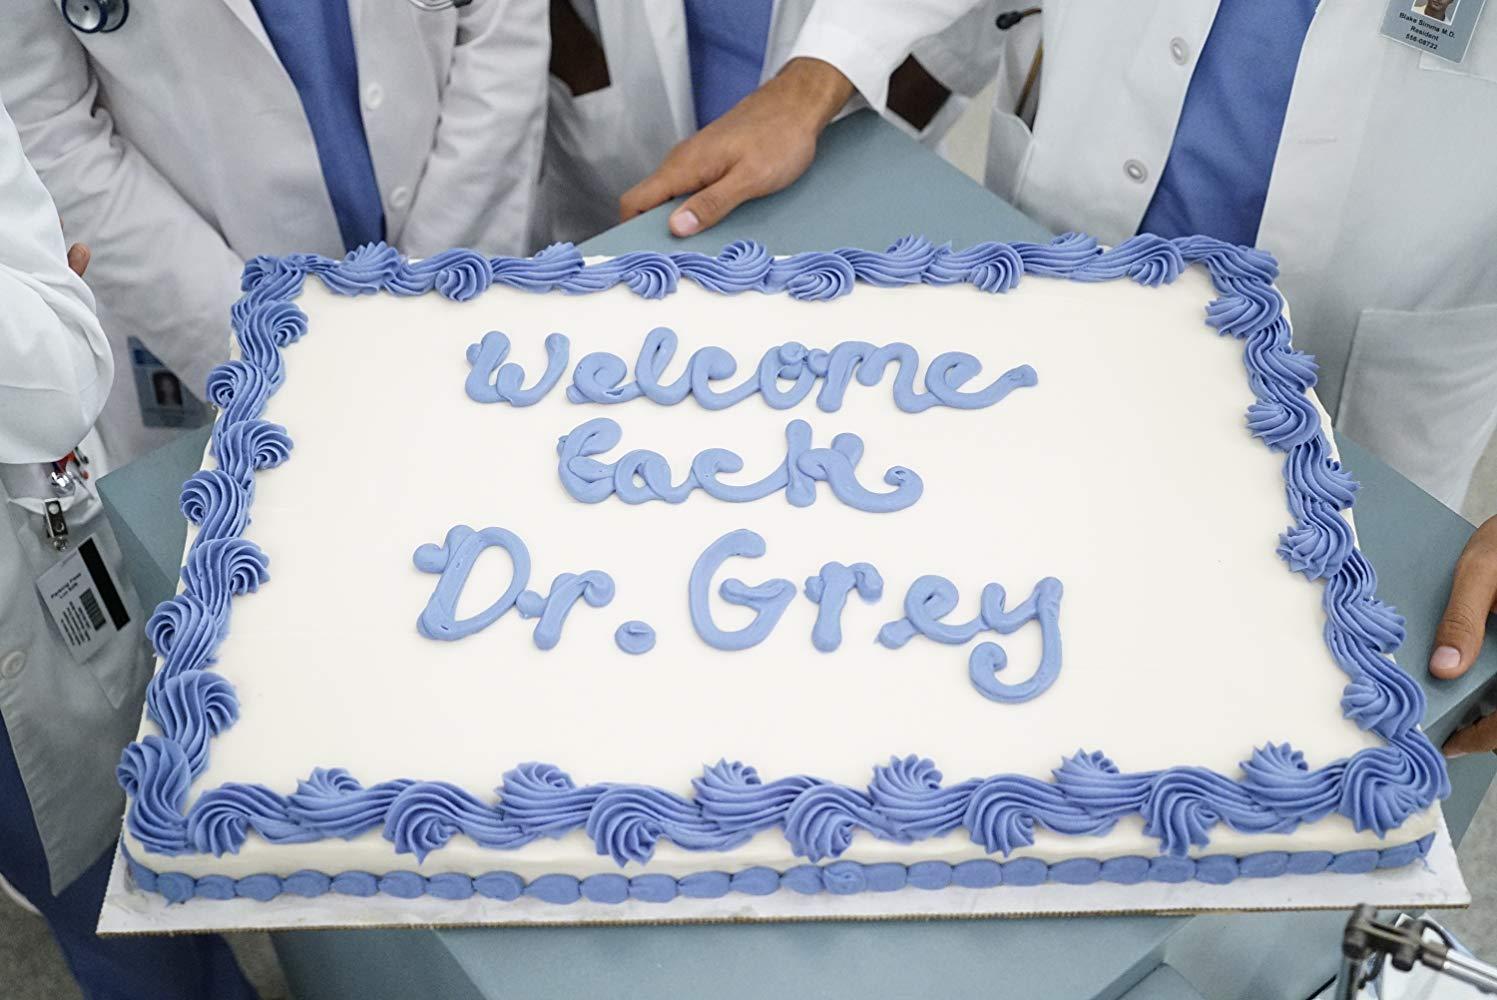 Grey's Anatomy: 6 maiores surpresas da fall finale (Spoilers)